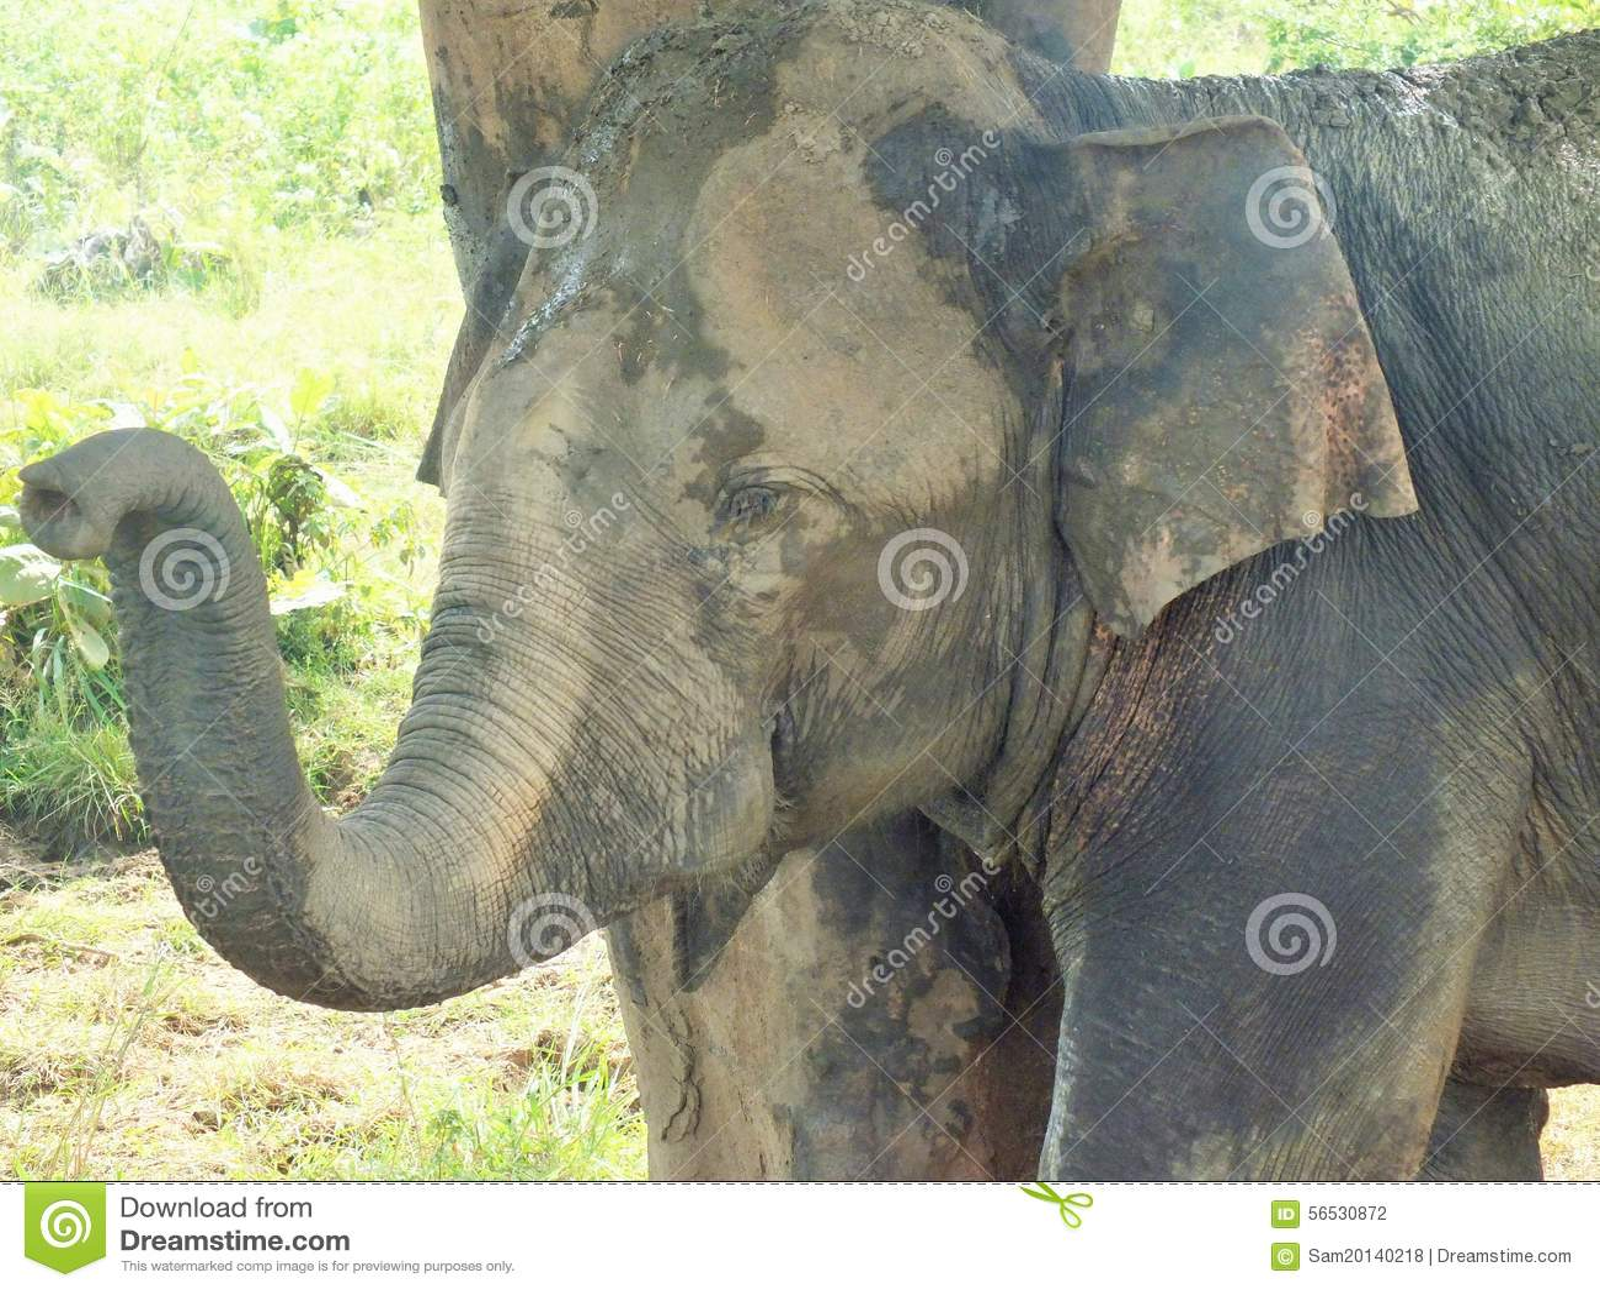 Elefant i naturligt omge i Sri Lanka